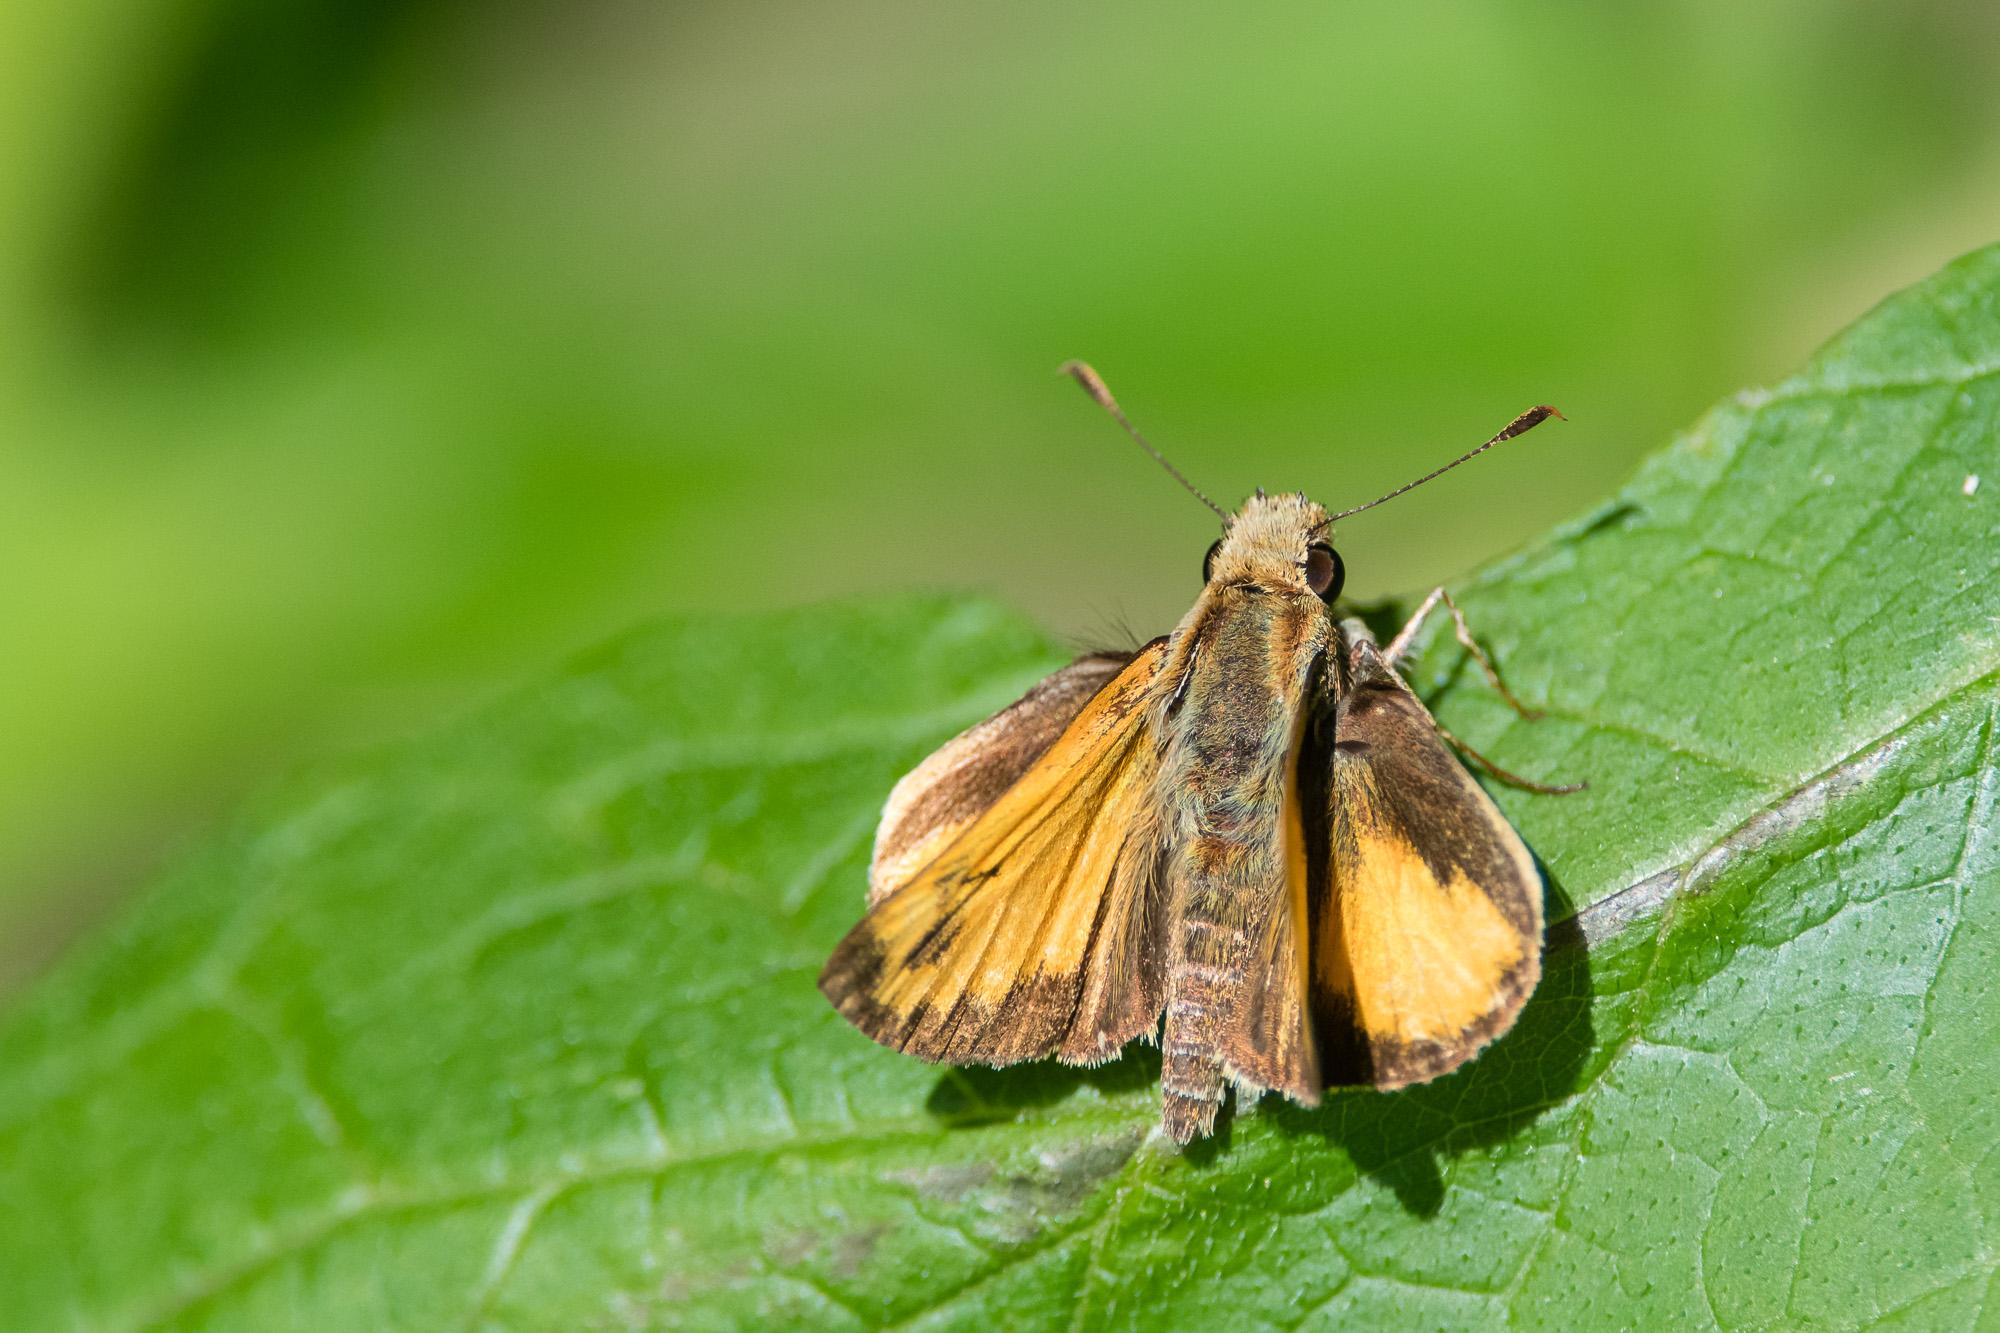 Skipper Butterfly (possibly Zabulon or Hobomok) on a leaf at Dyke Marsh Wildlife Preserve in Alexandria, Virginia.